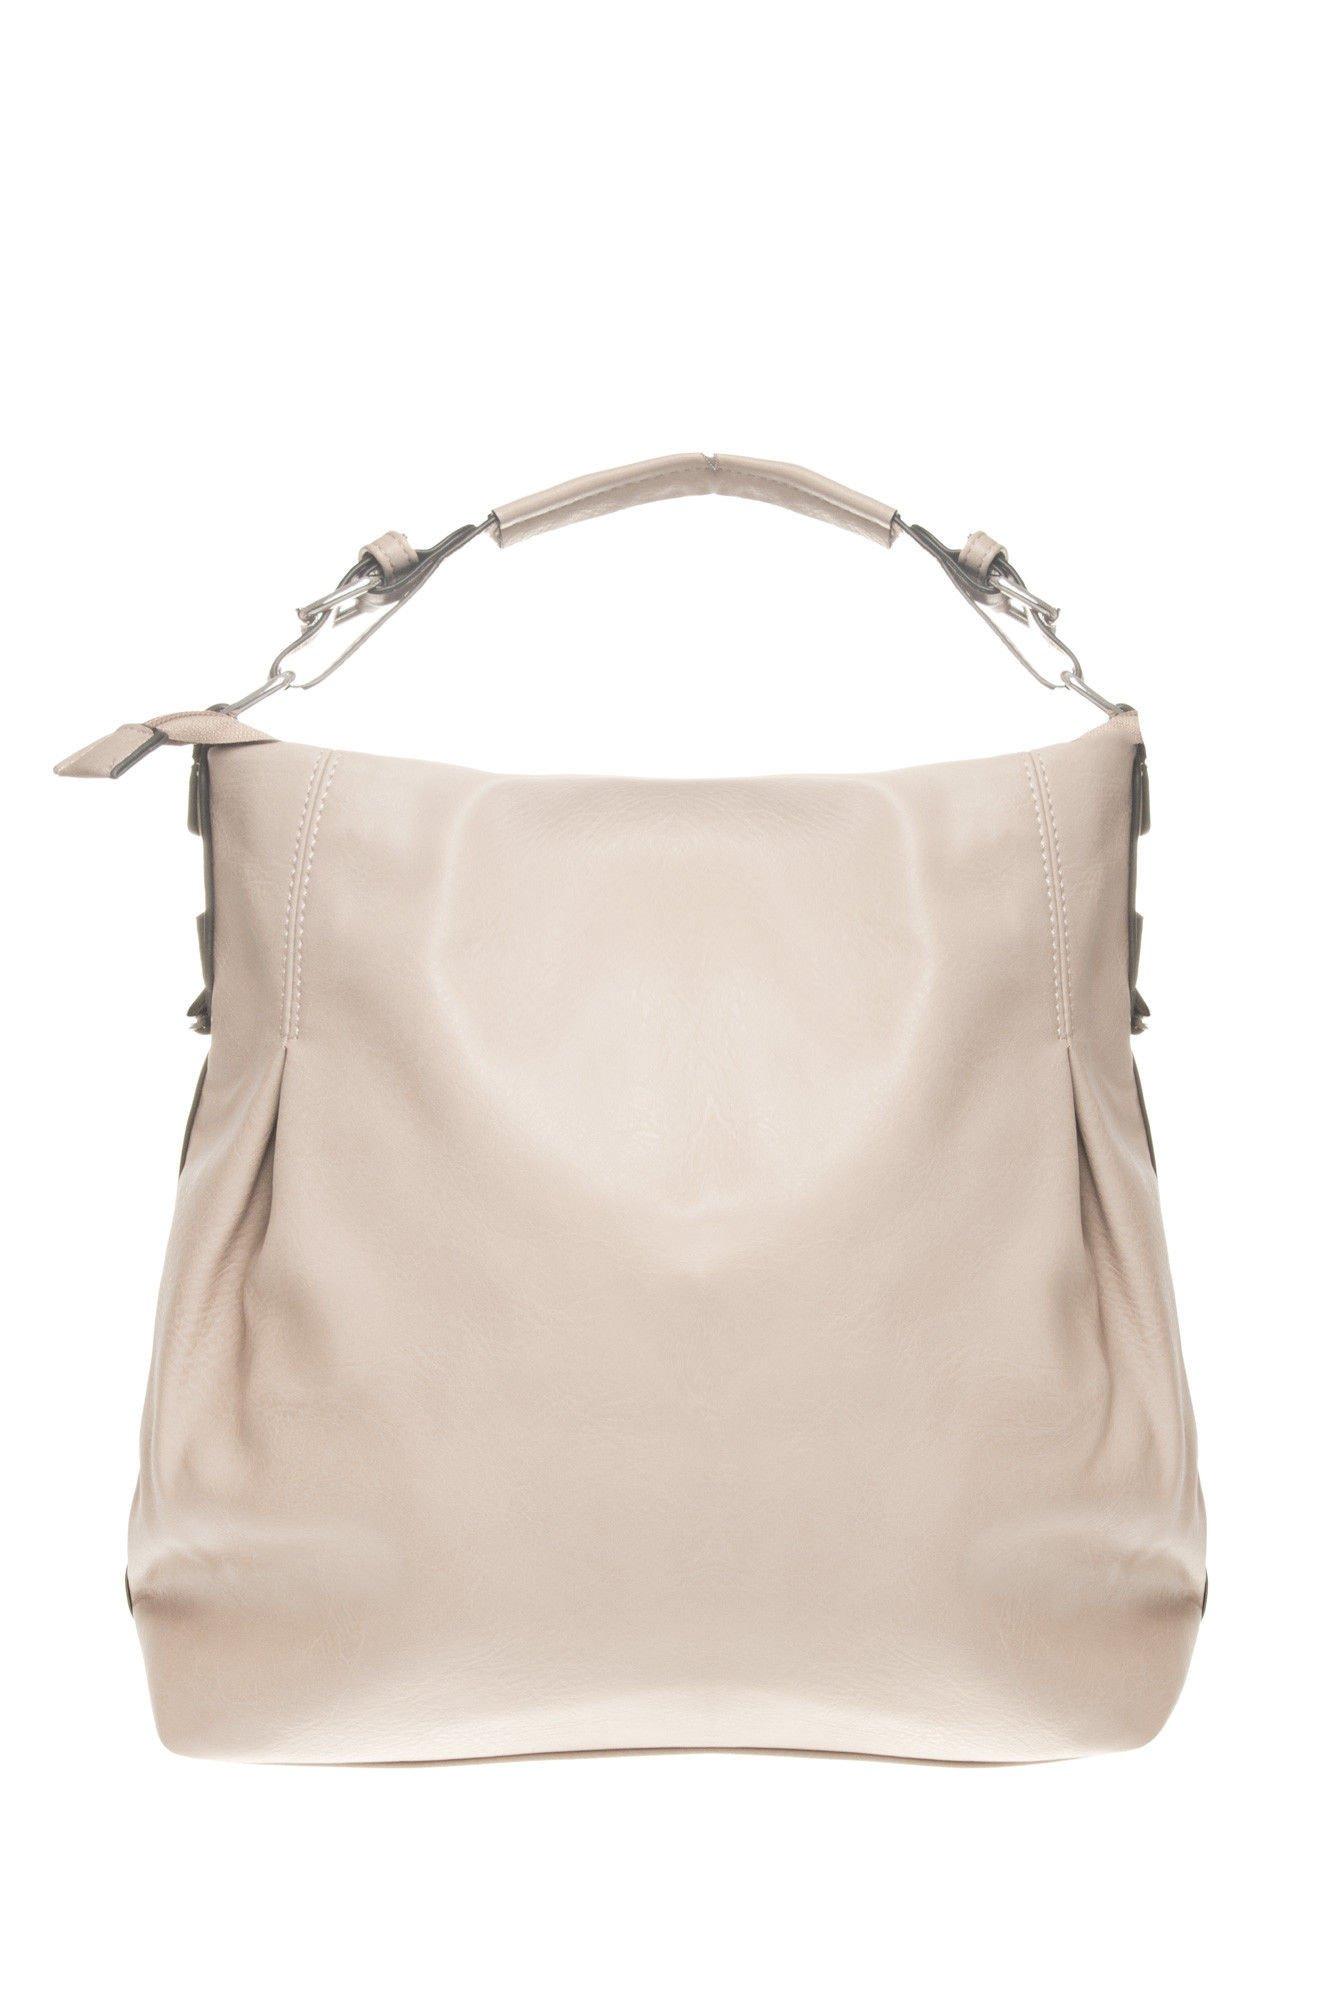 Beżowa torebka hobo na ramię                                  zdj.                                  1